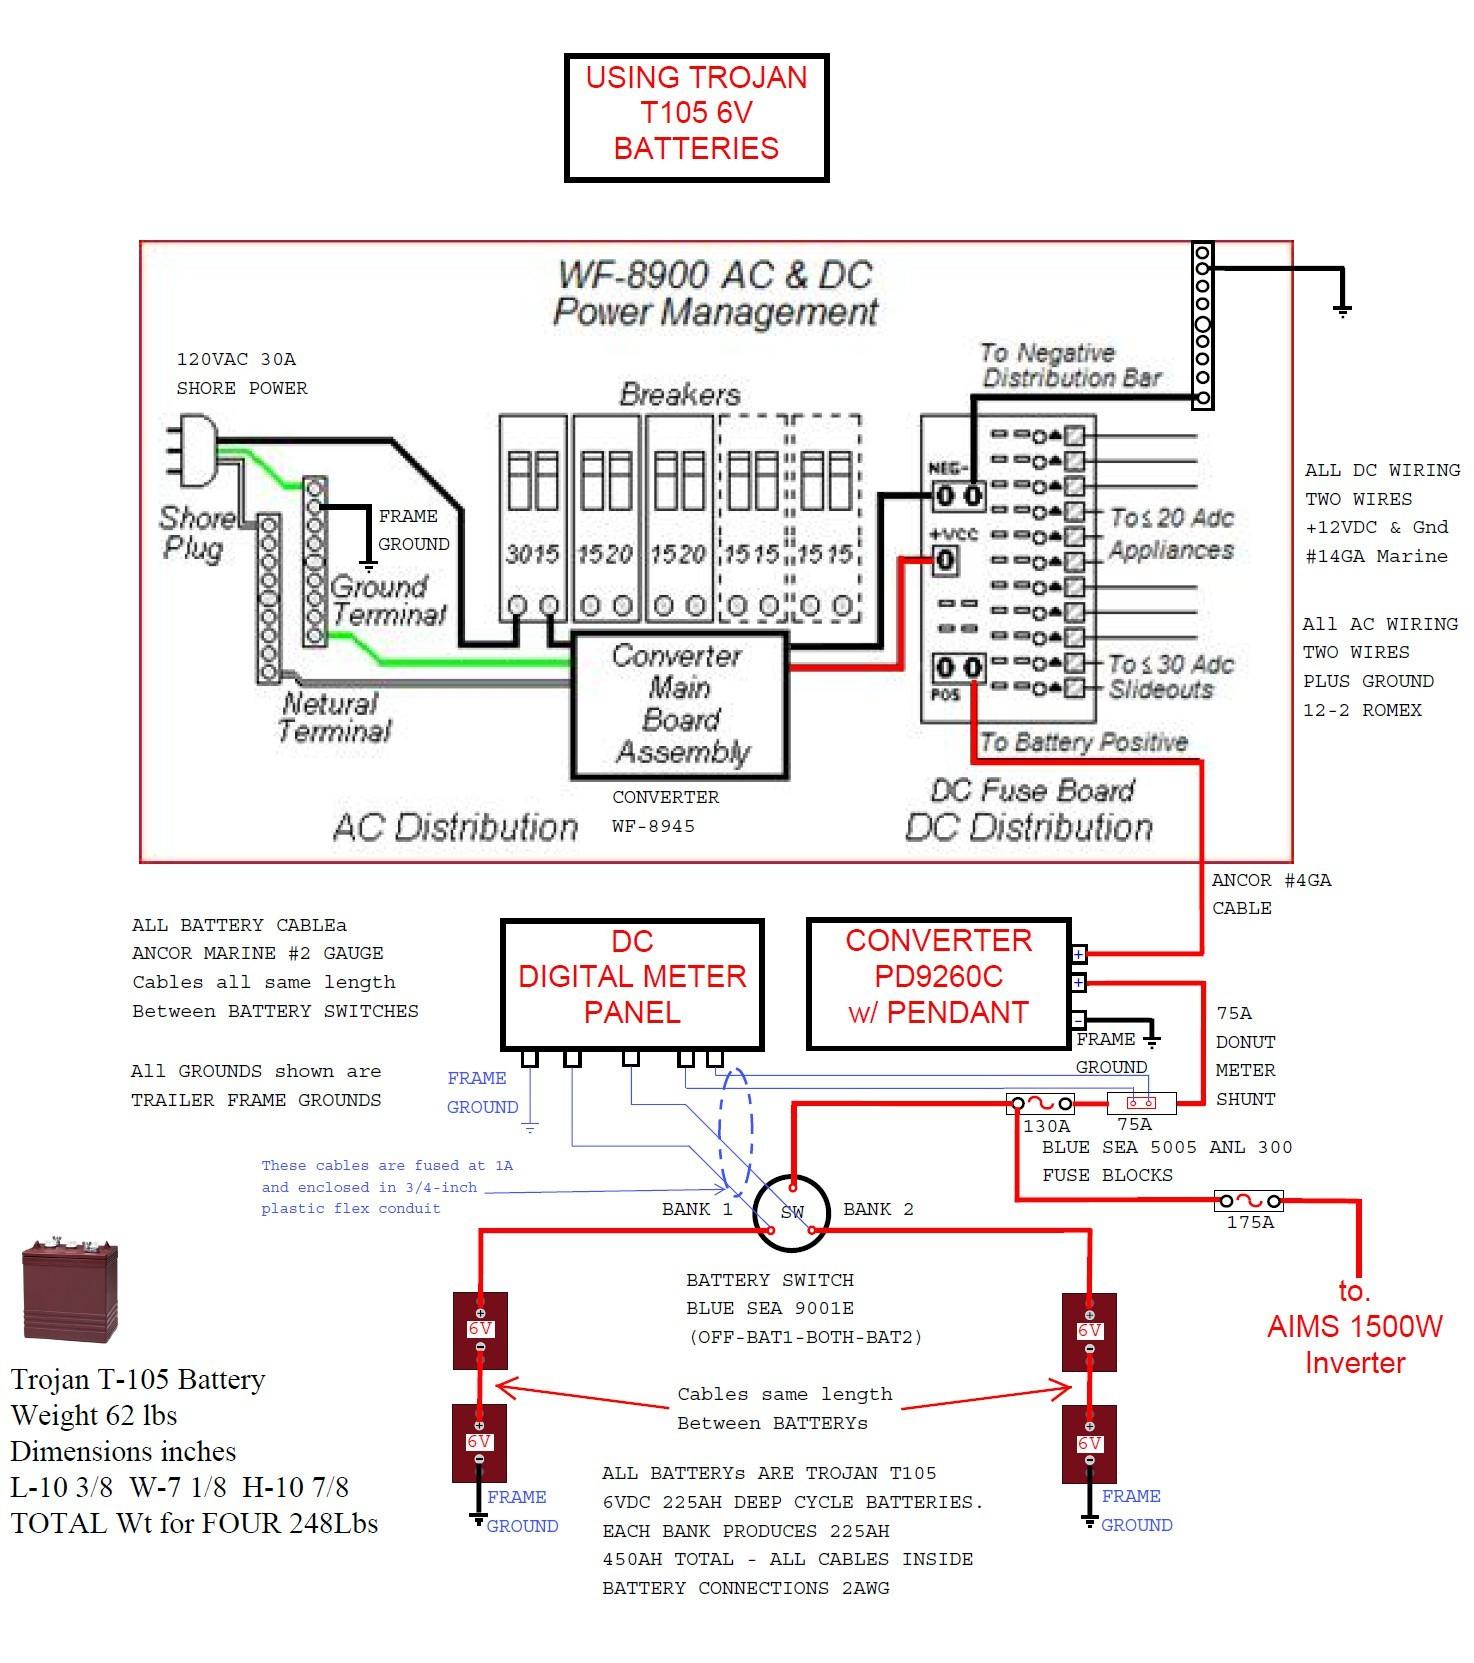 Rv Power Converter Wiring Diagram | Wiring Diagram - Rv Power Inverter Wiring Diagram